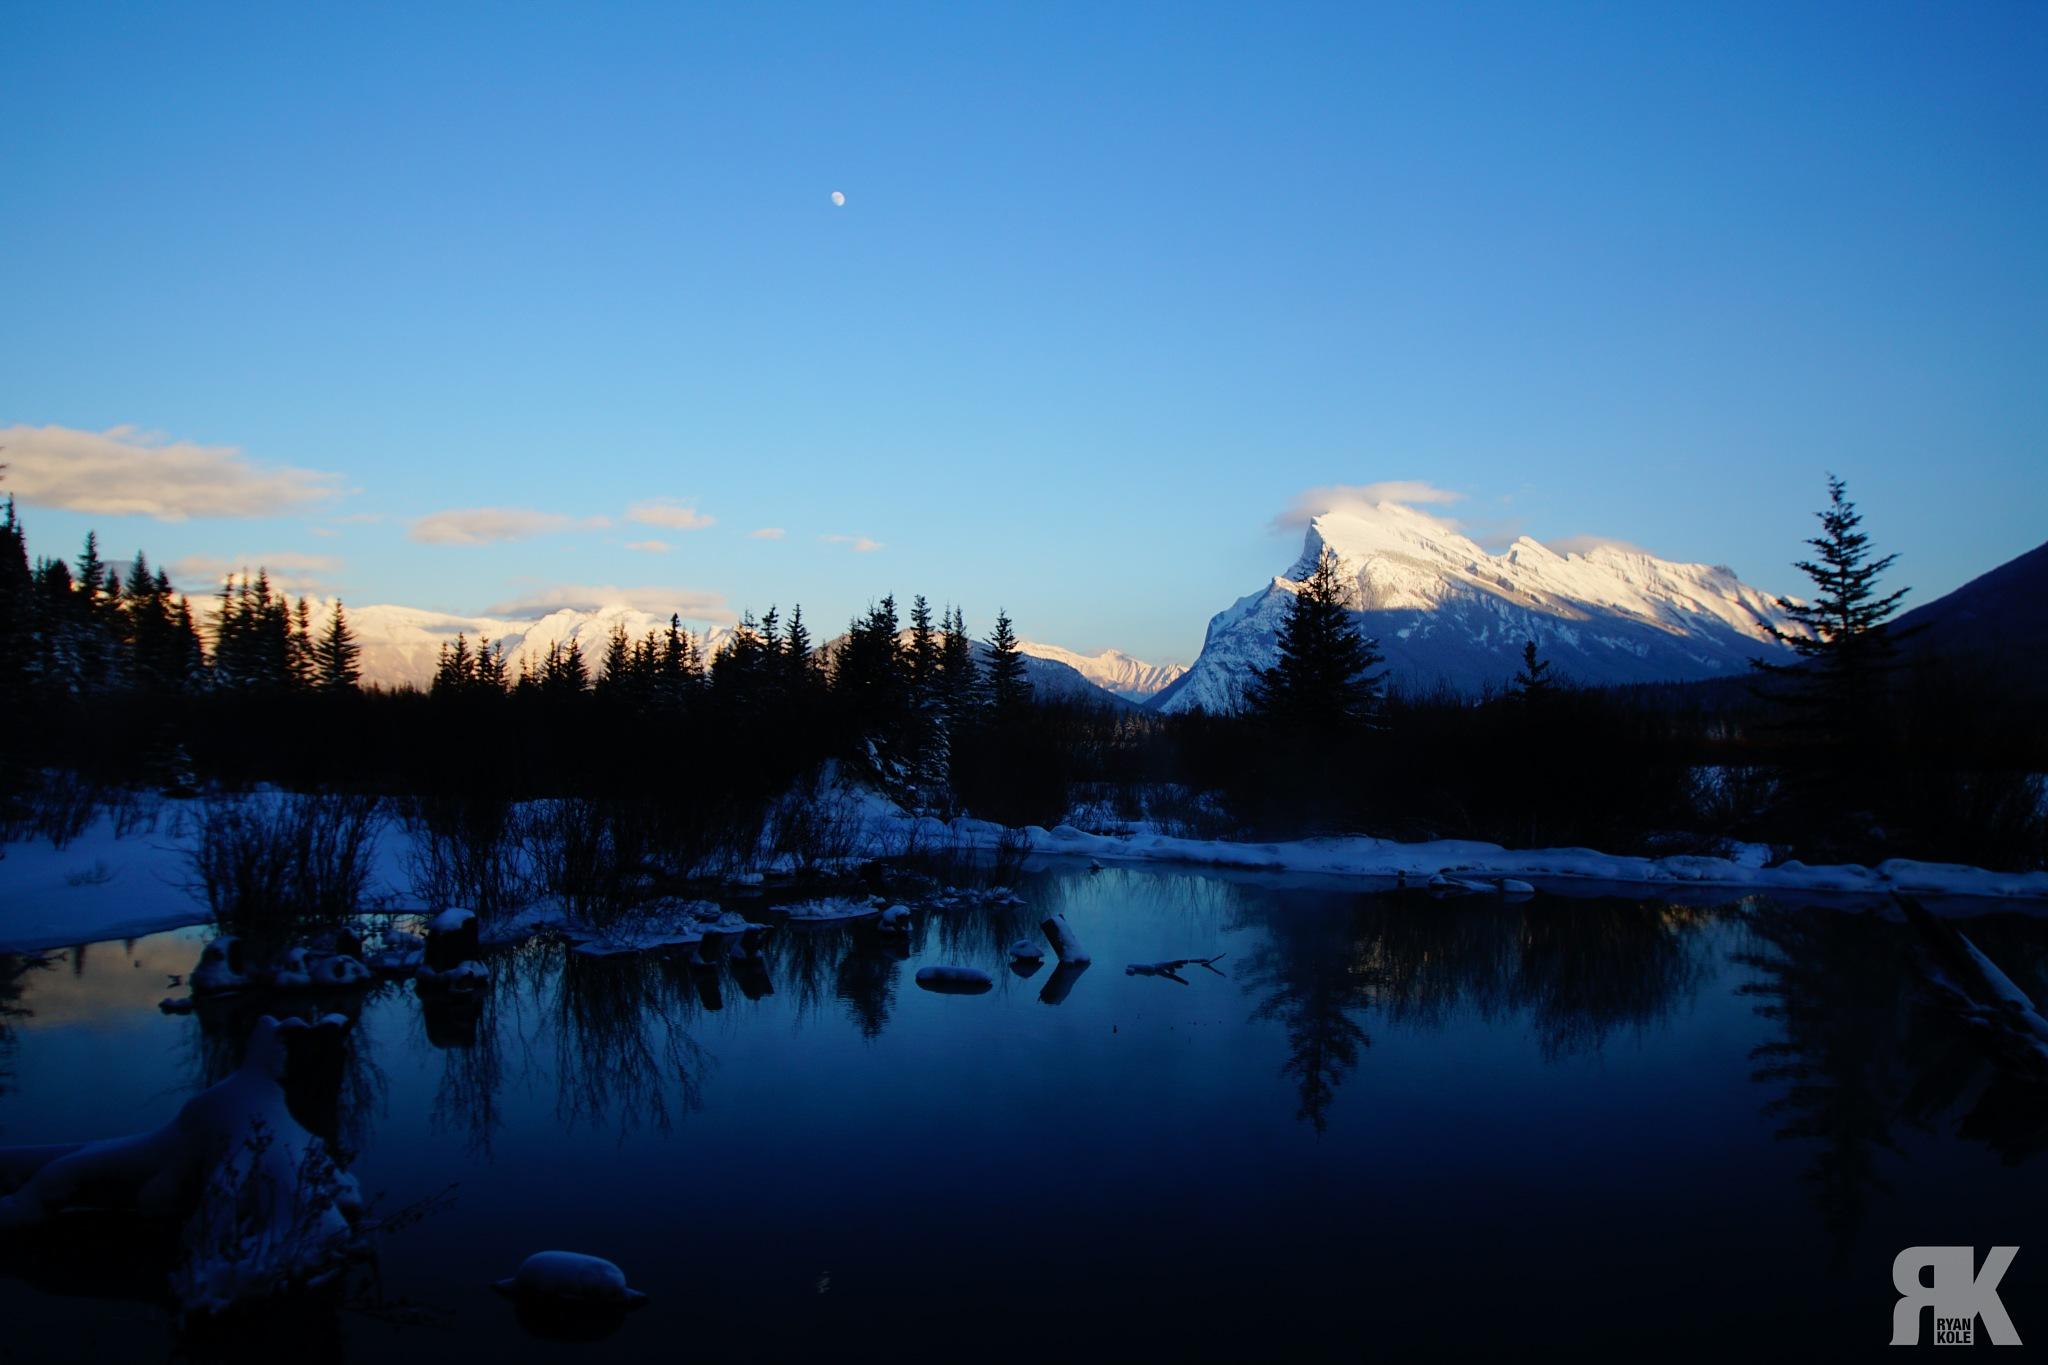 Winter Wonderland by Ryan Kole